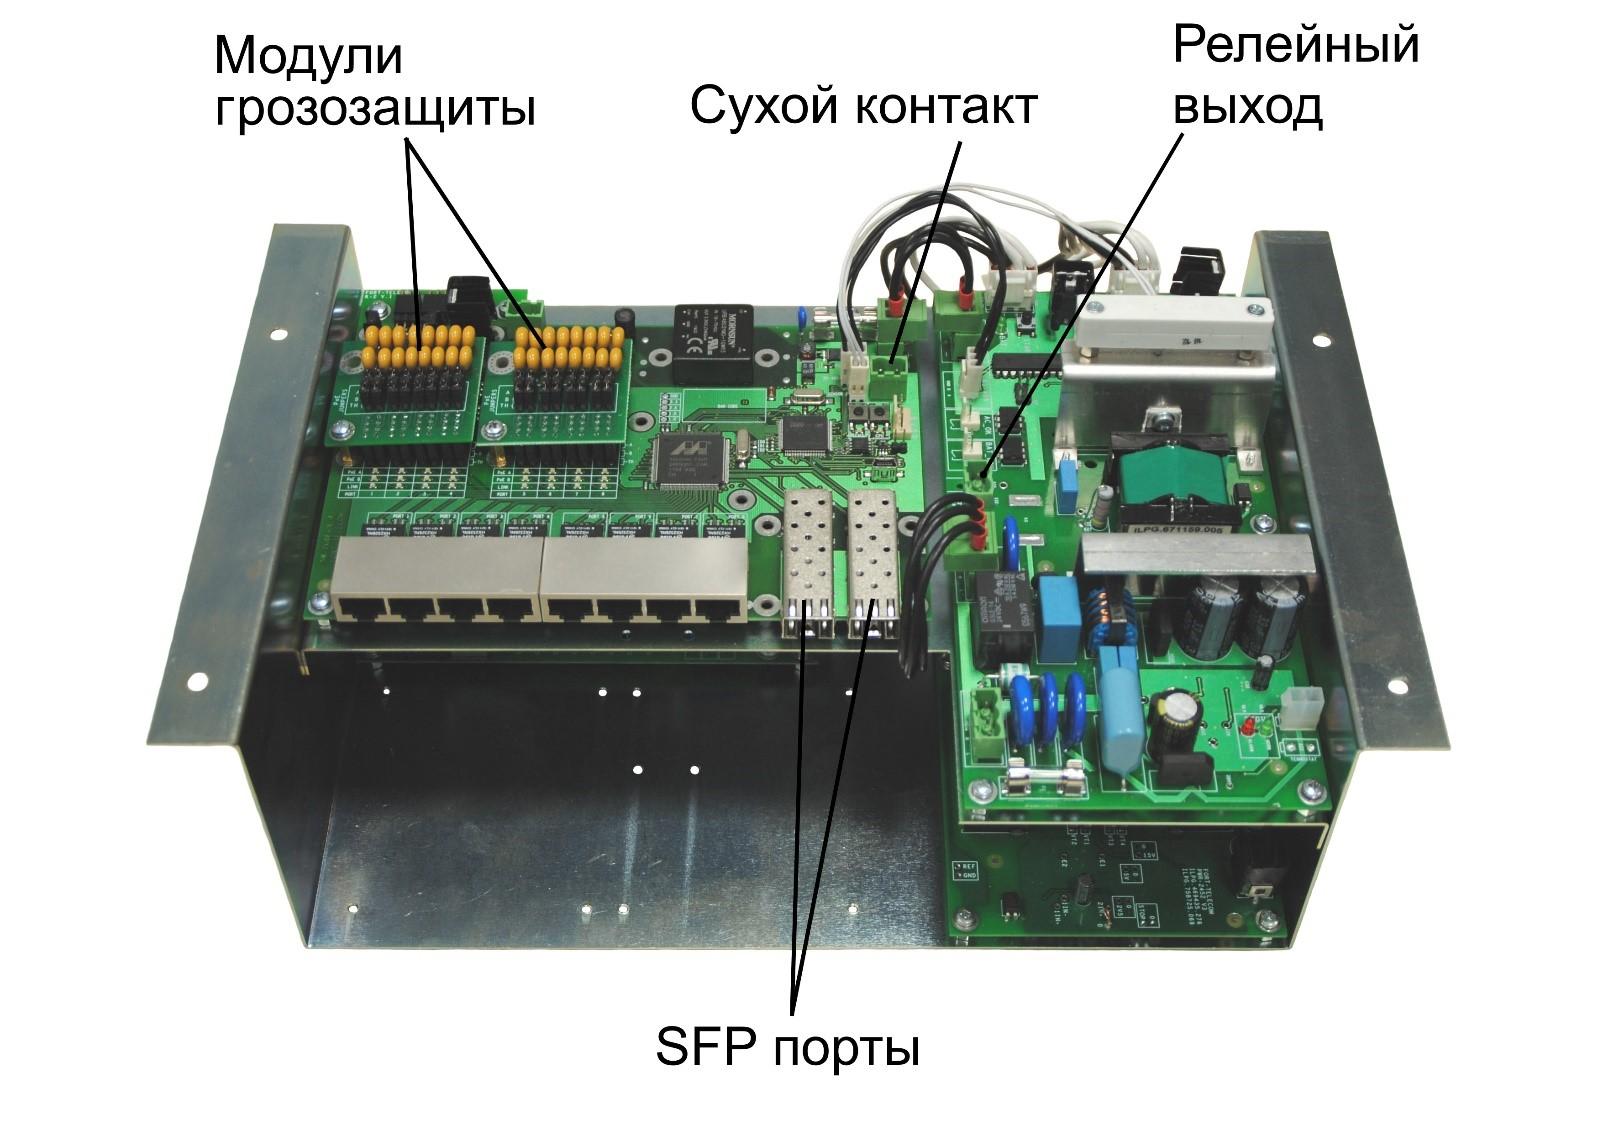 Коммутатор TFortis PSW-2G8F+UPS-Box - Акрон-СБ